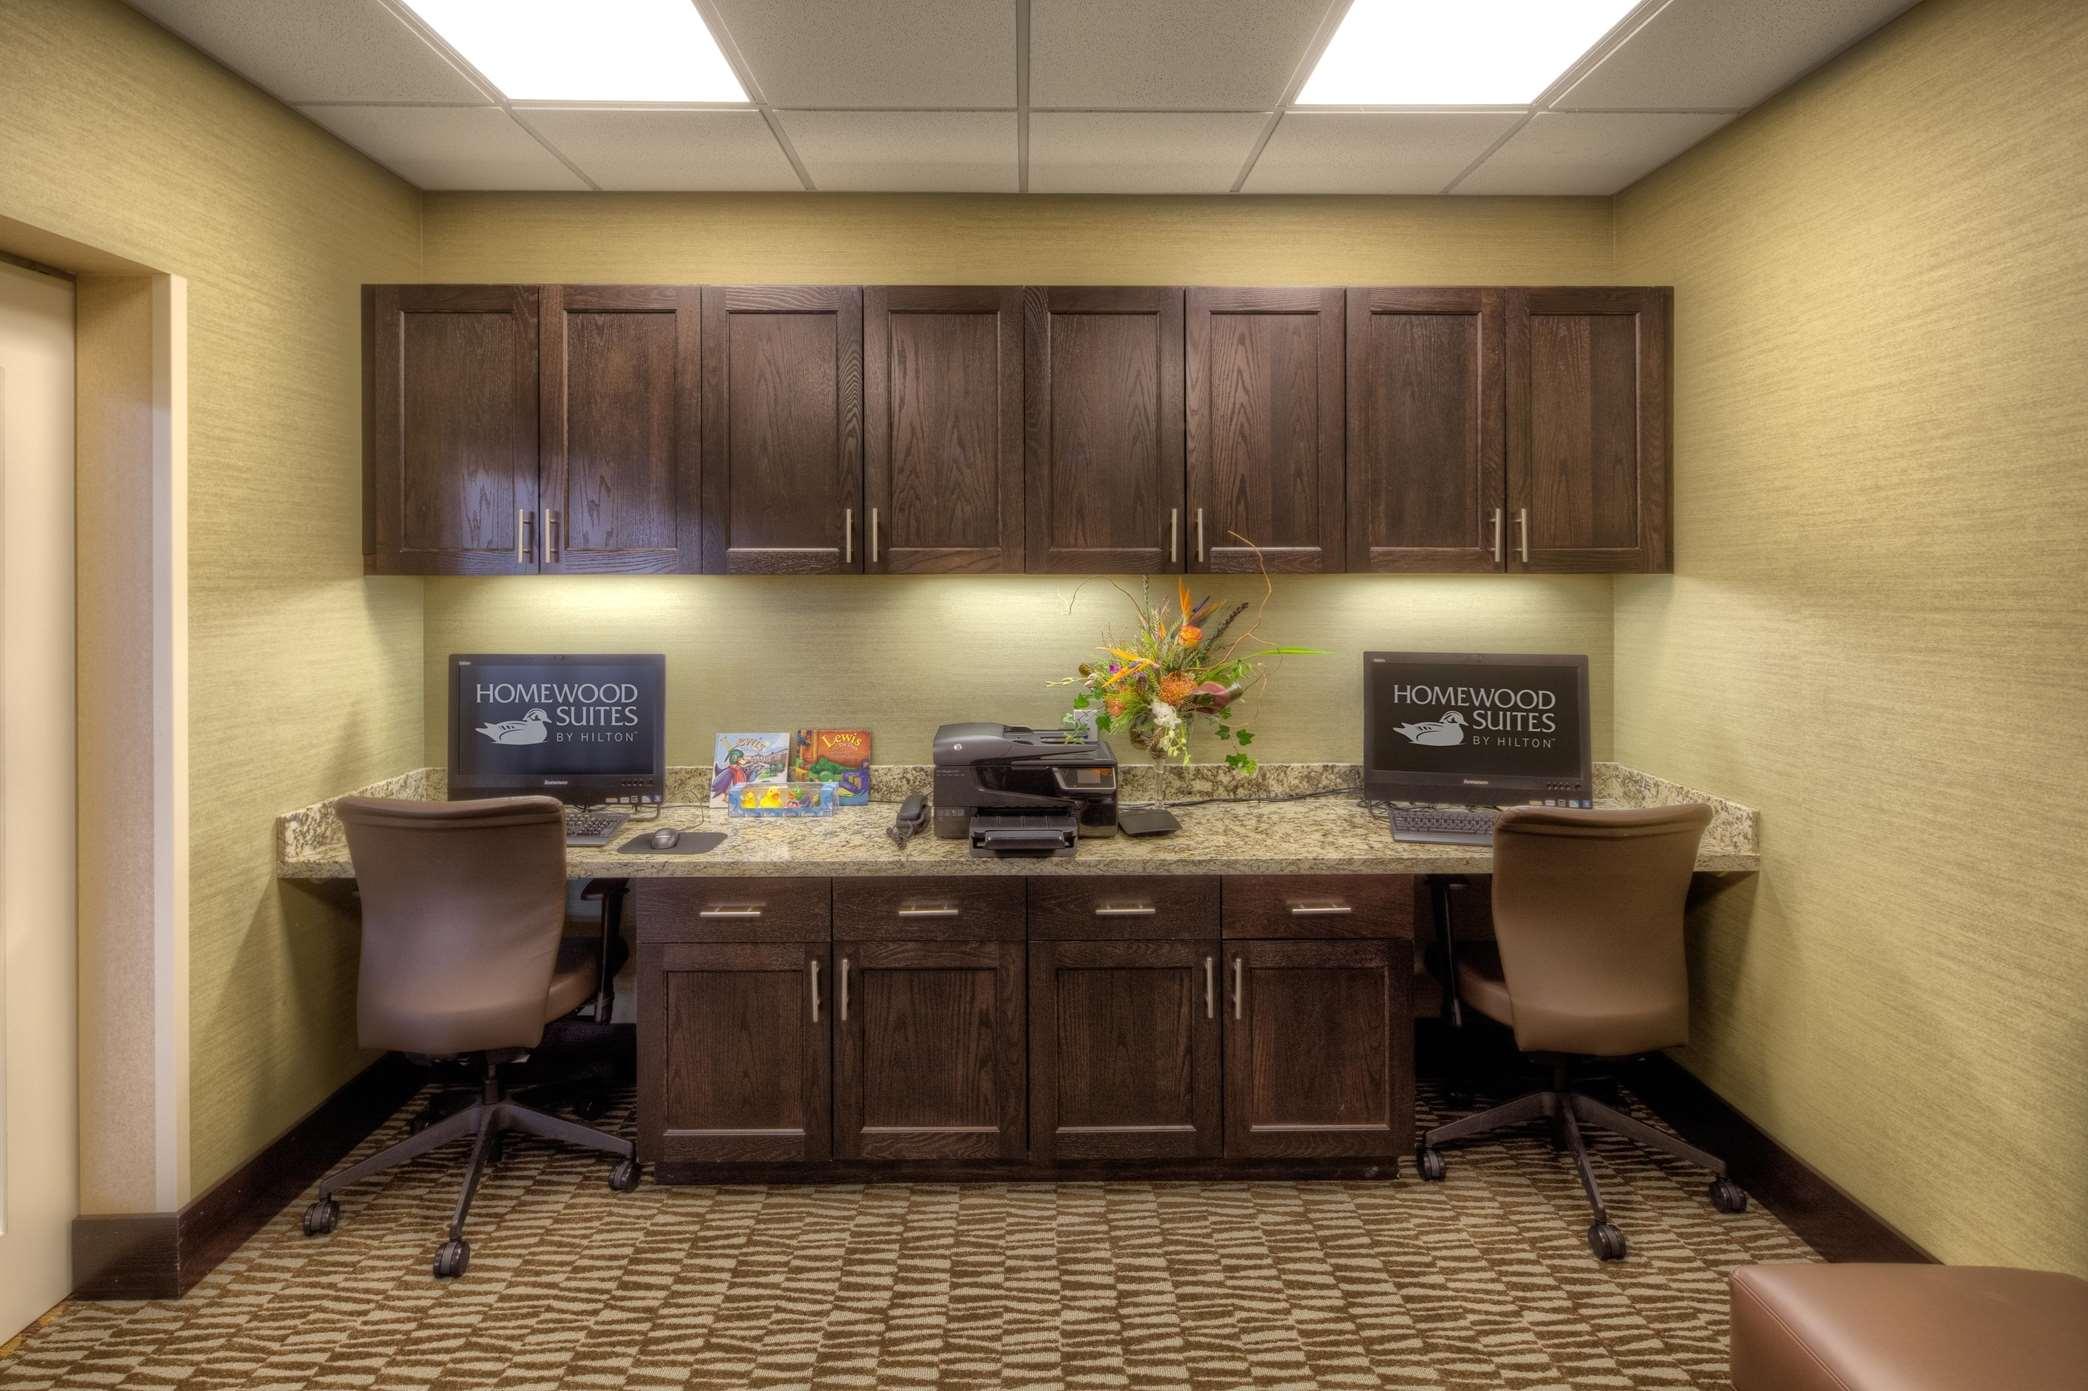 Homewood Suites by Hilton Victoria, TX image 18